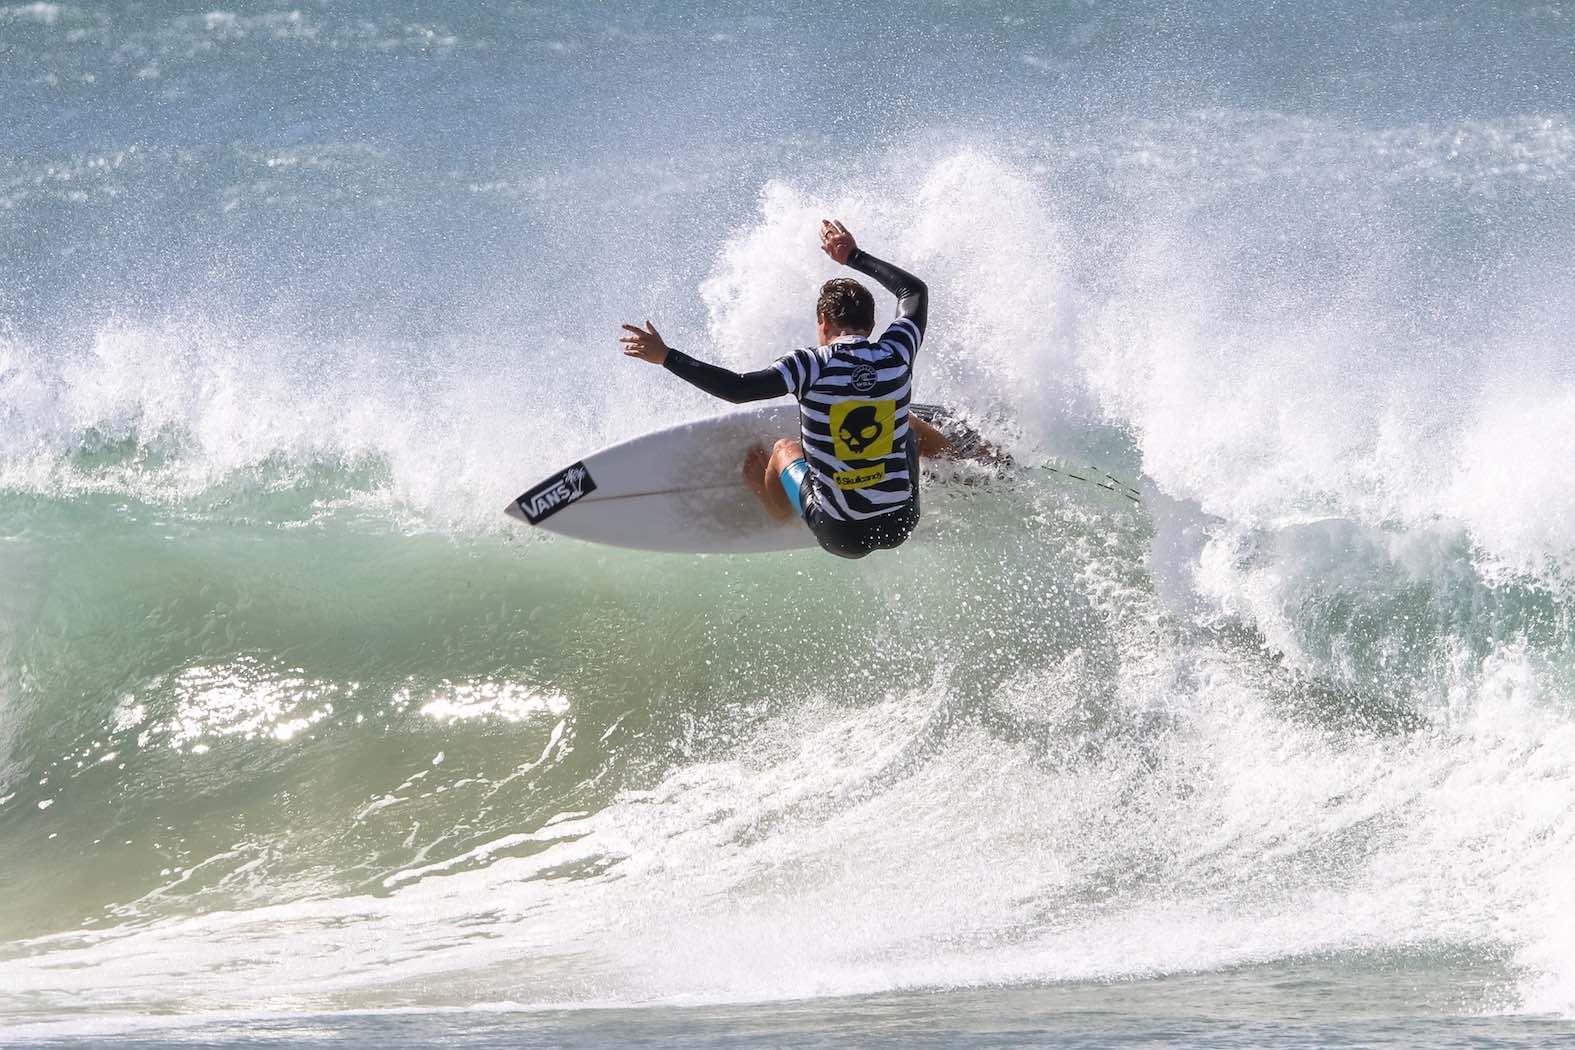 David van Zyl surfing his way to victory in the 2018 Volkswagen Nelson Mandela Bay Surf Pro